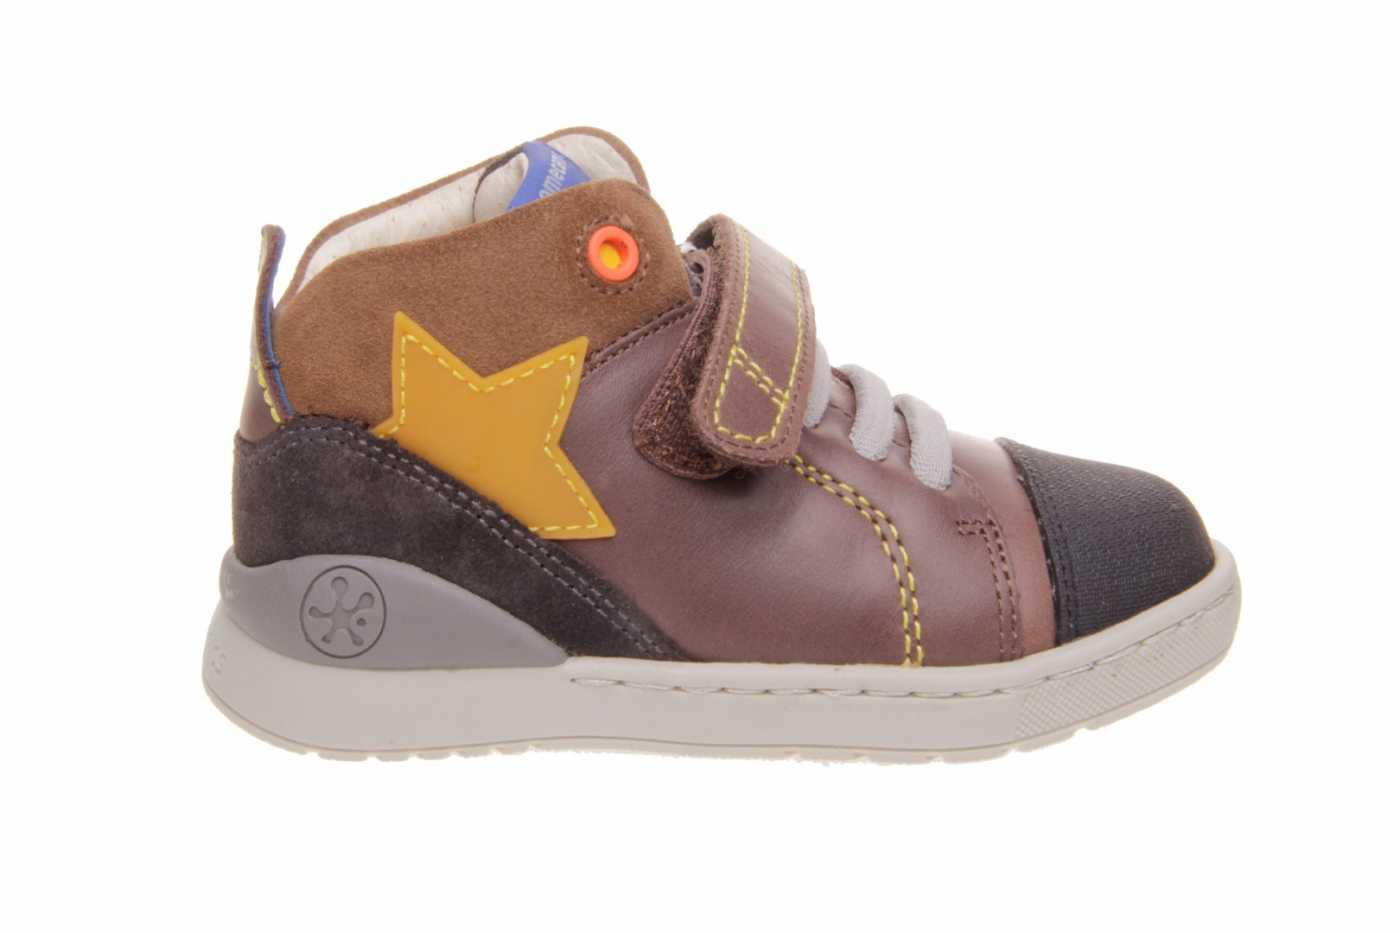 Dibujar disparar A rayas  Comprar zapato BIOMECANICS para JOVEN NIÑO estilo BOTAS color MARRON PIEL